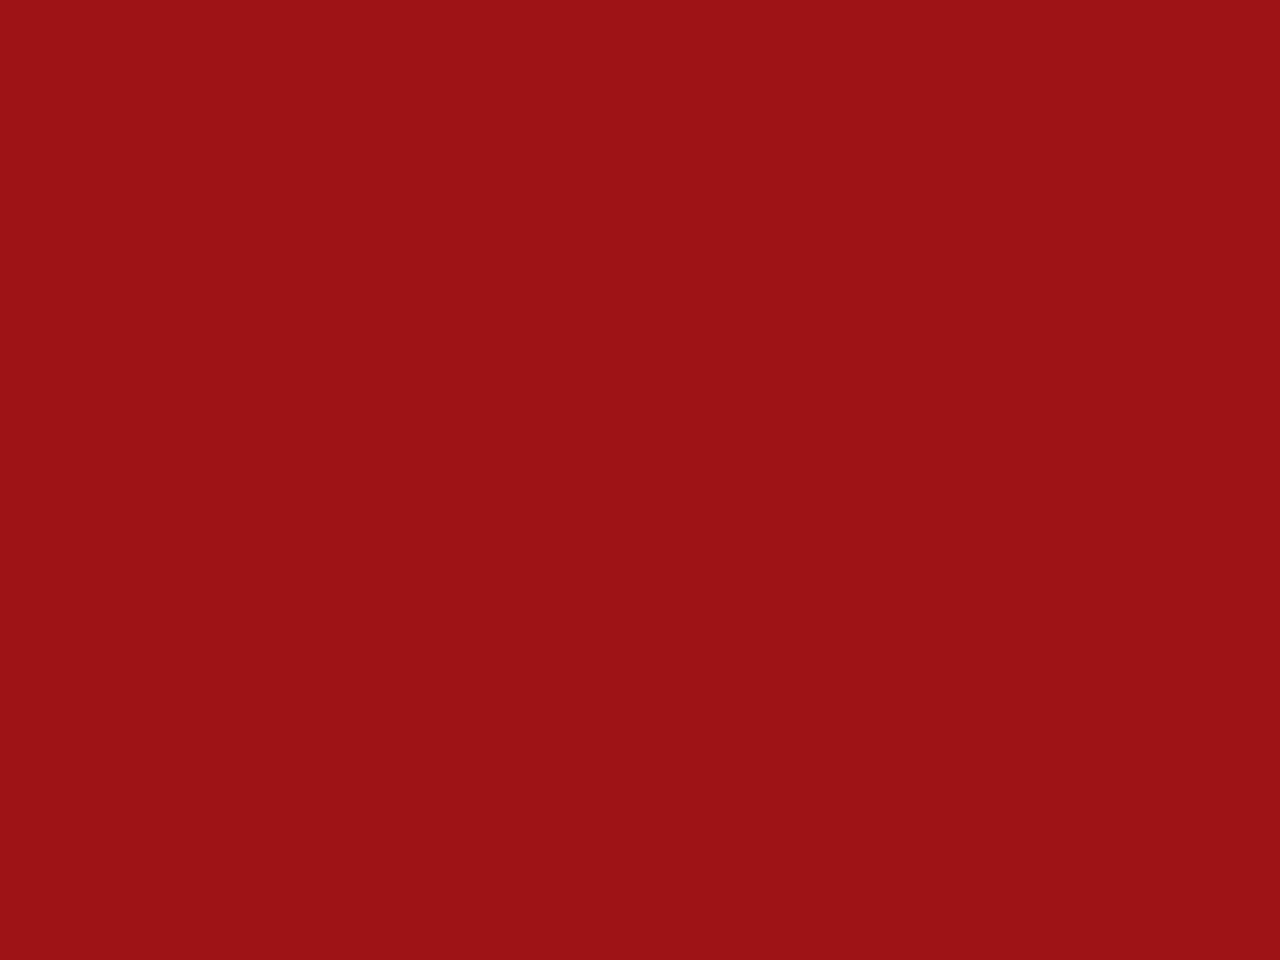 1280x960 Spartan Crimson Solid Color Background